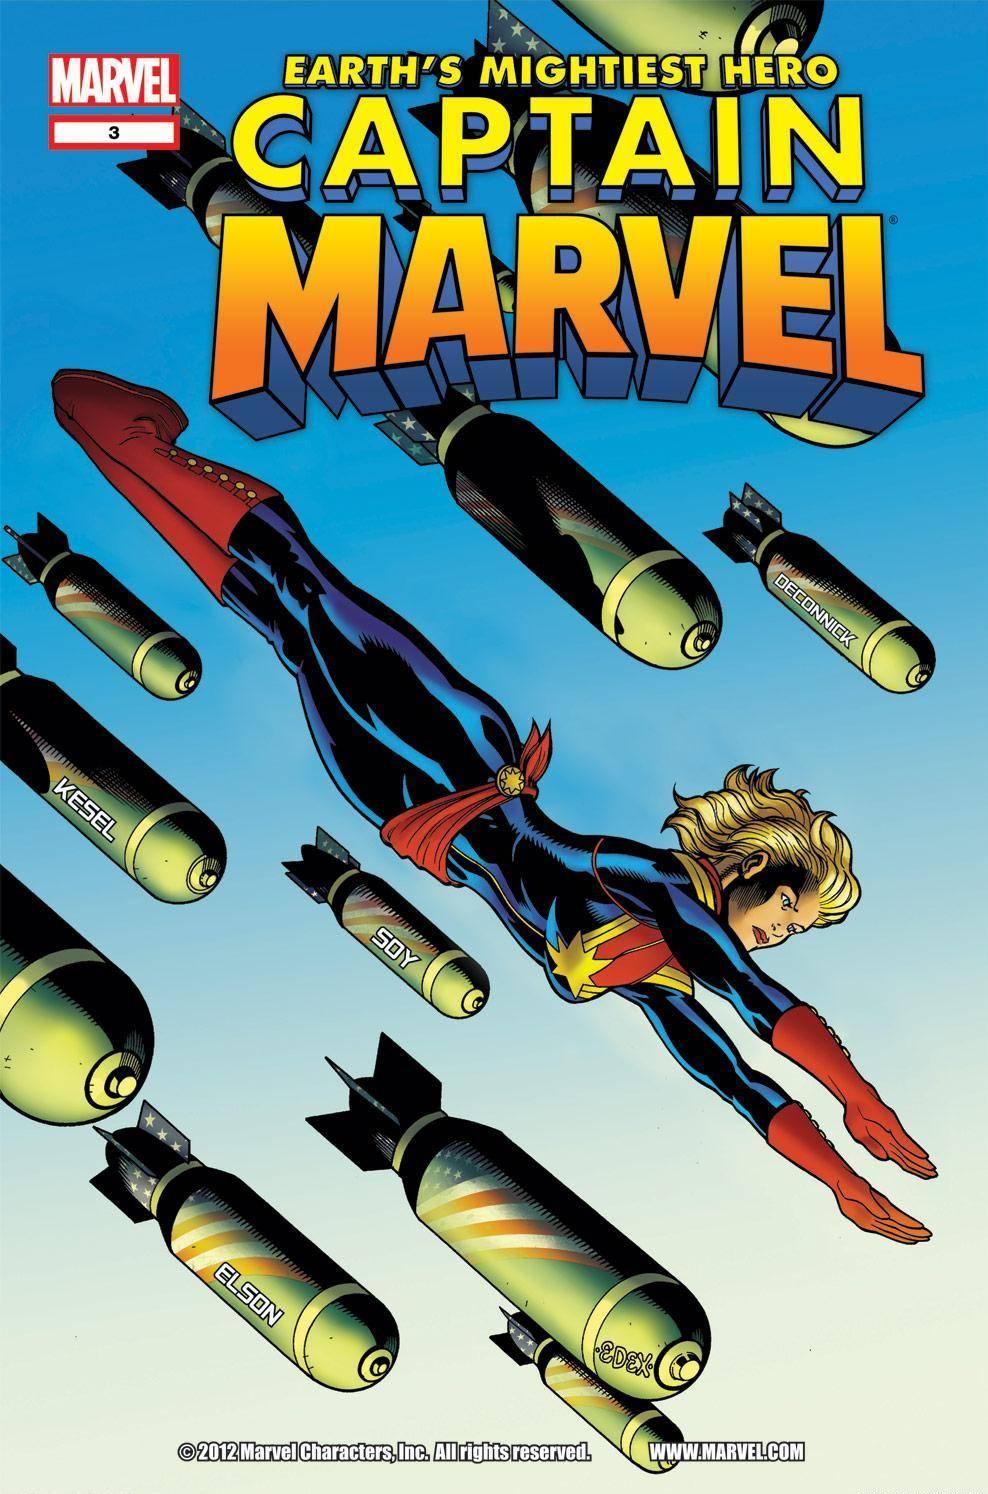 Captain.Marvel.003.2012.digital-TheGroup